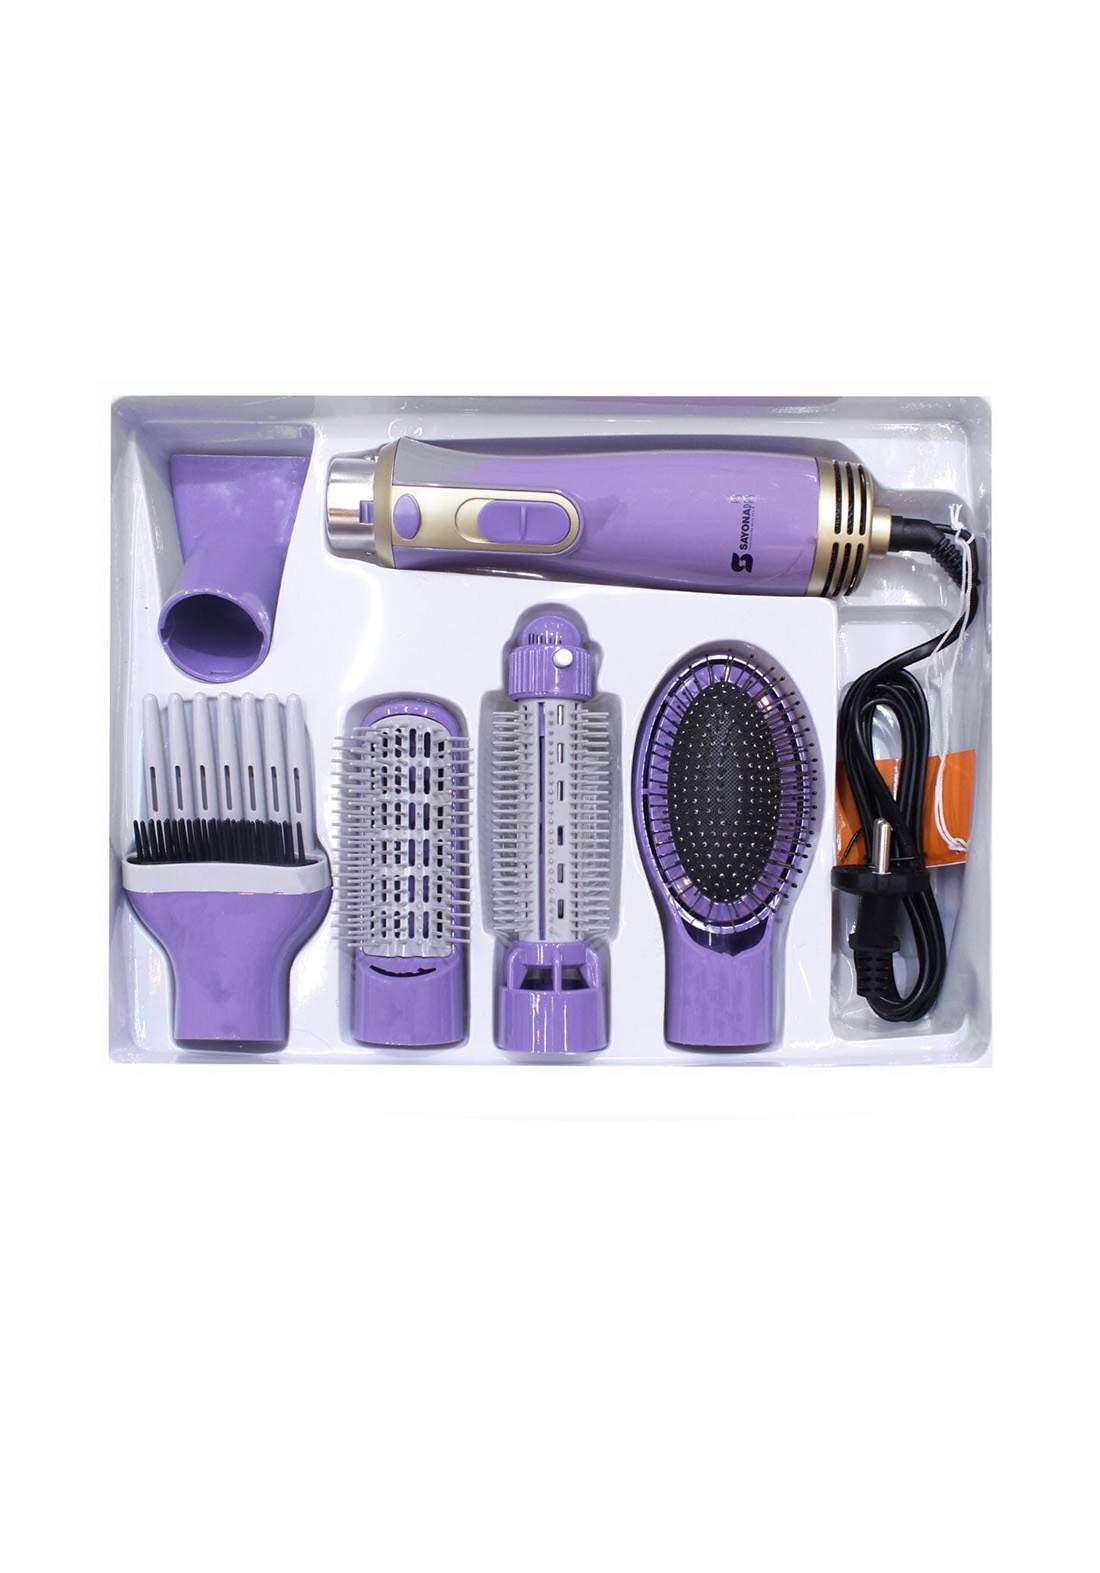 Sayona 9284 Hair dryer (6 in 1) 600 Watt  مجفف شعر